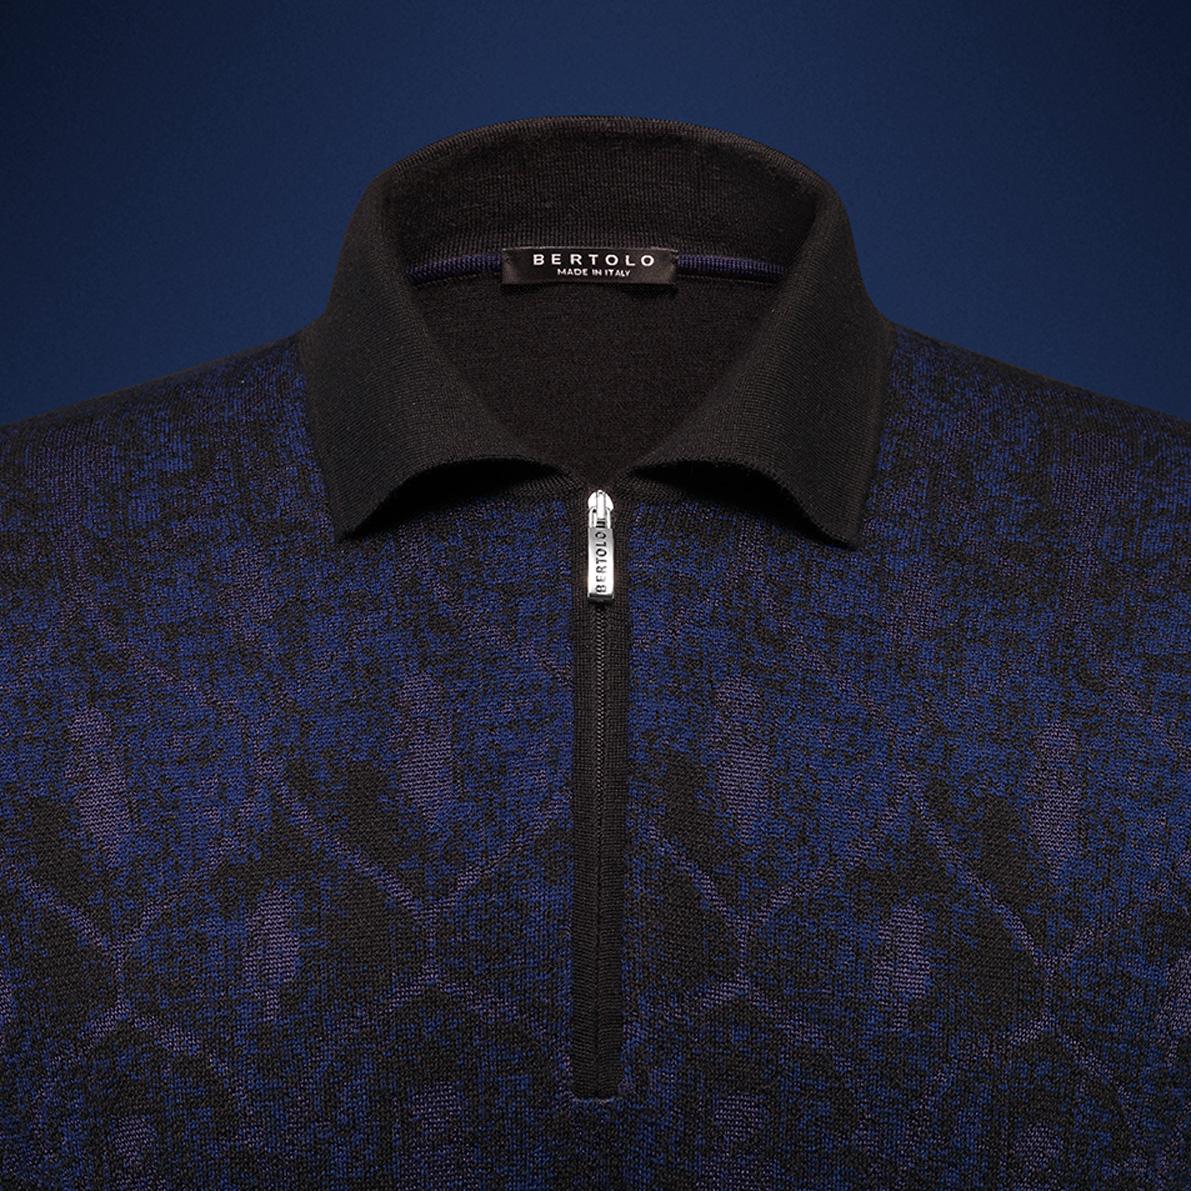 Bertolo Luxury Menswear - collection gallery 1